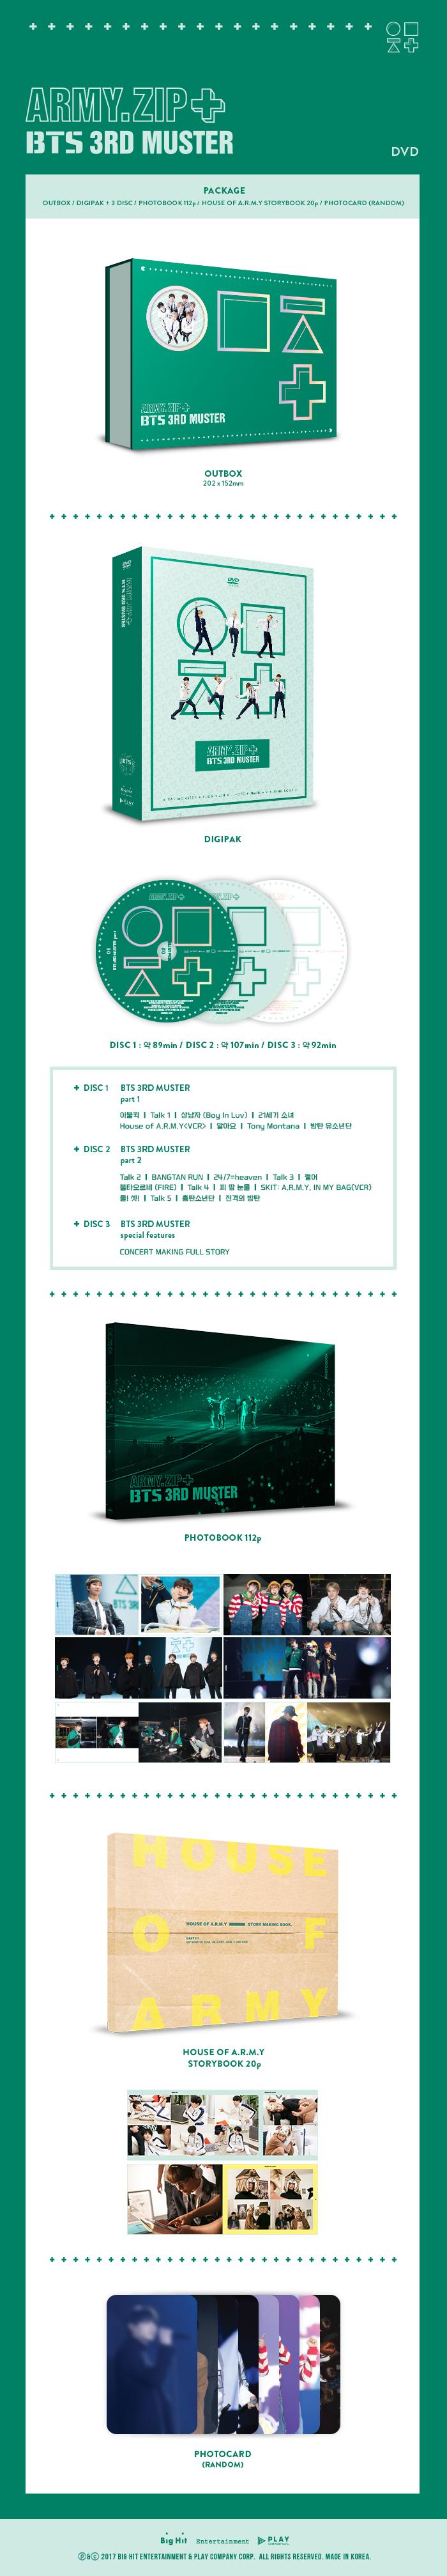 INFO] BTS 3RD MUSTER 'ARMY ZIP+' DVD & Blu-Ray |